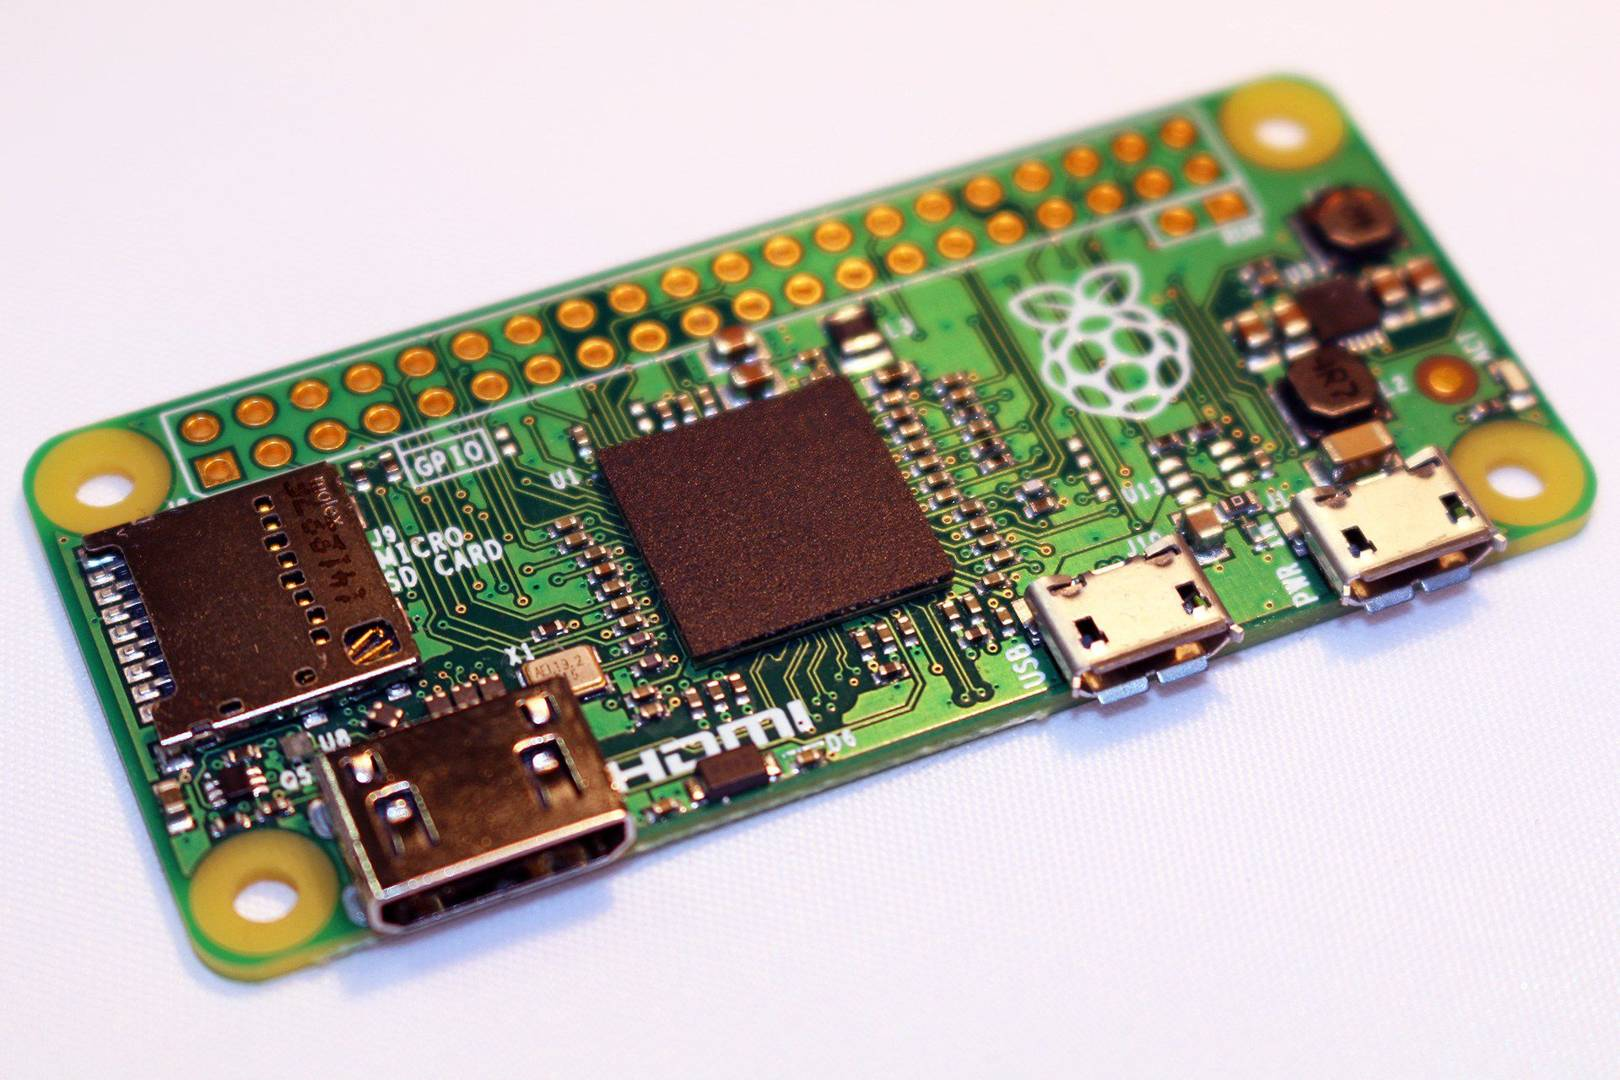 Raspberry pi zero a computer for 5 - Raspberry Pi Zero A Computer For 5 10